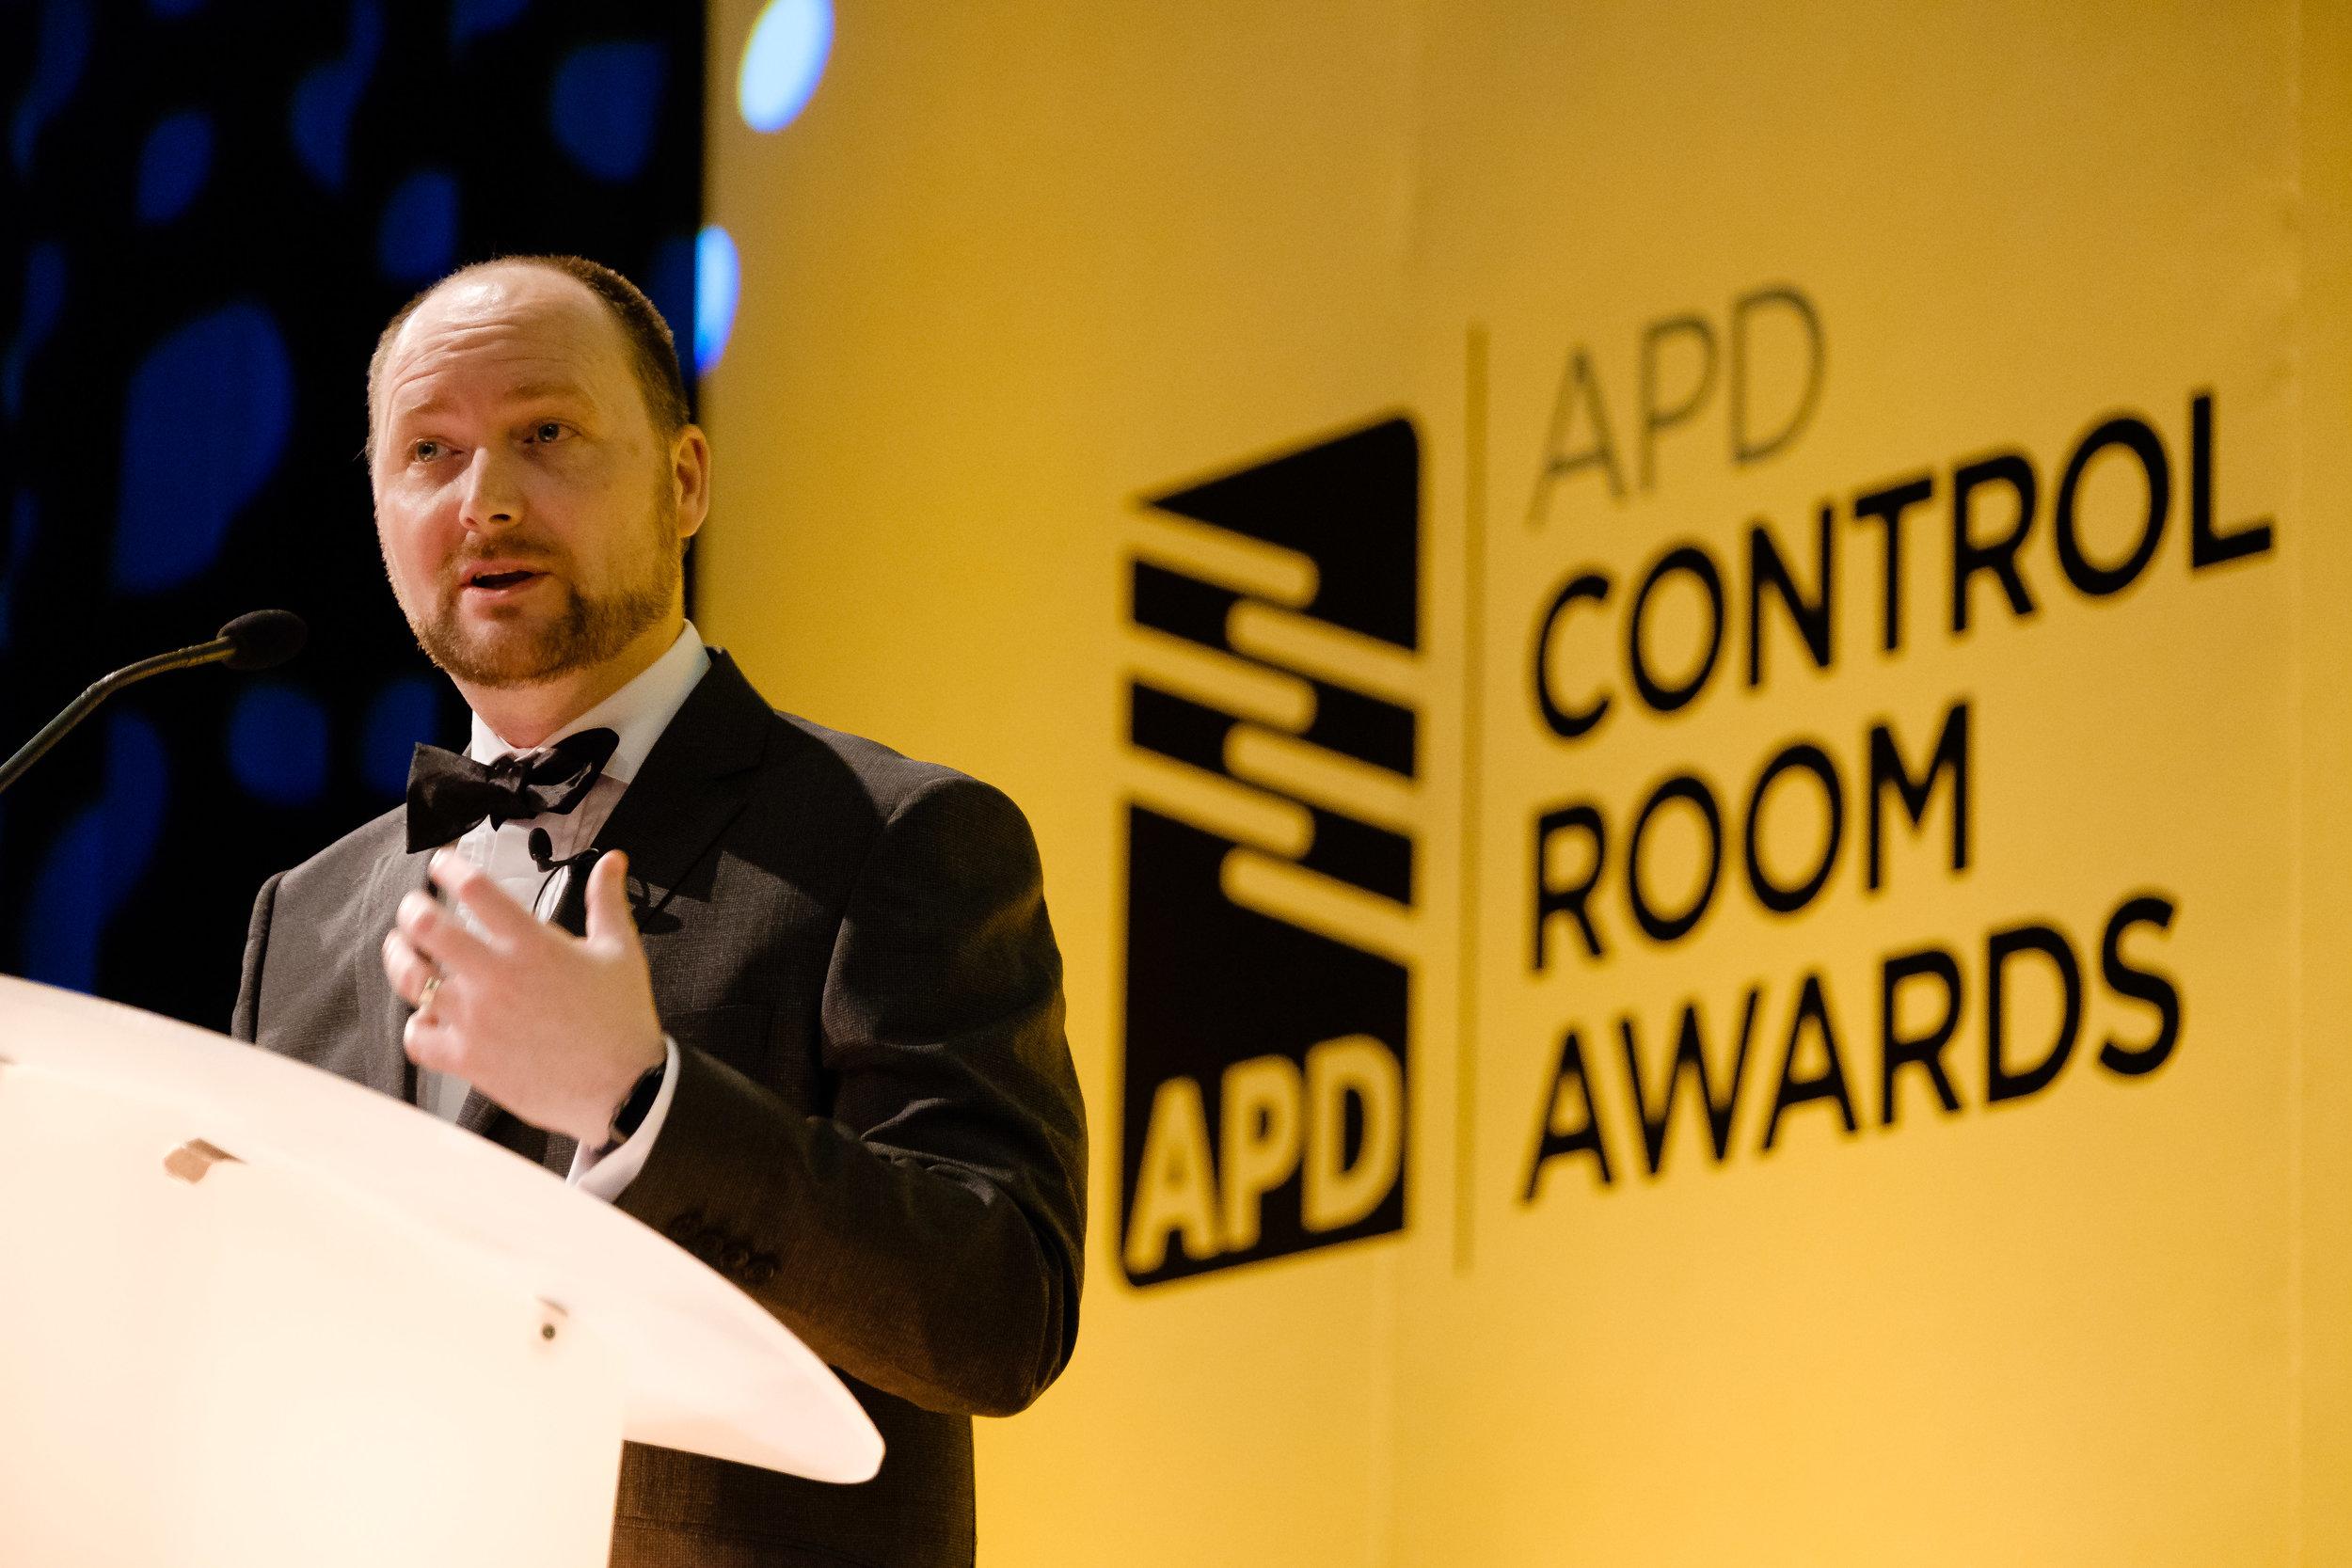 APD Managing Director Mike Isherwood